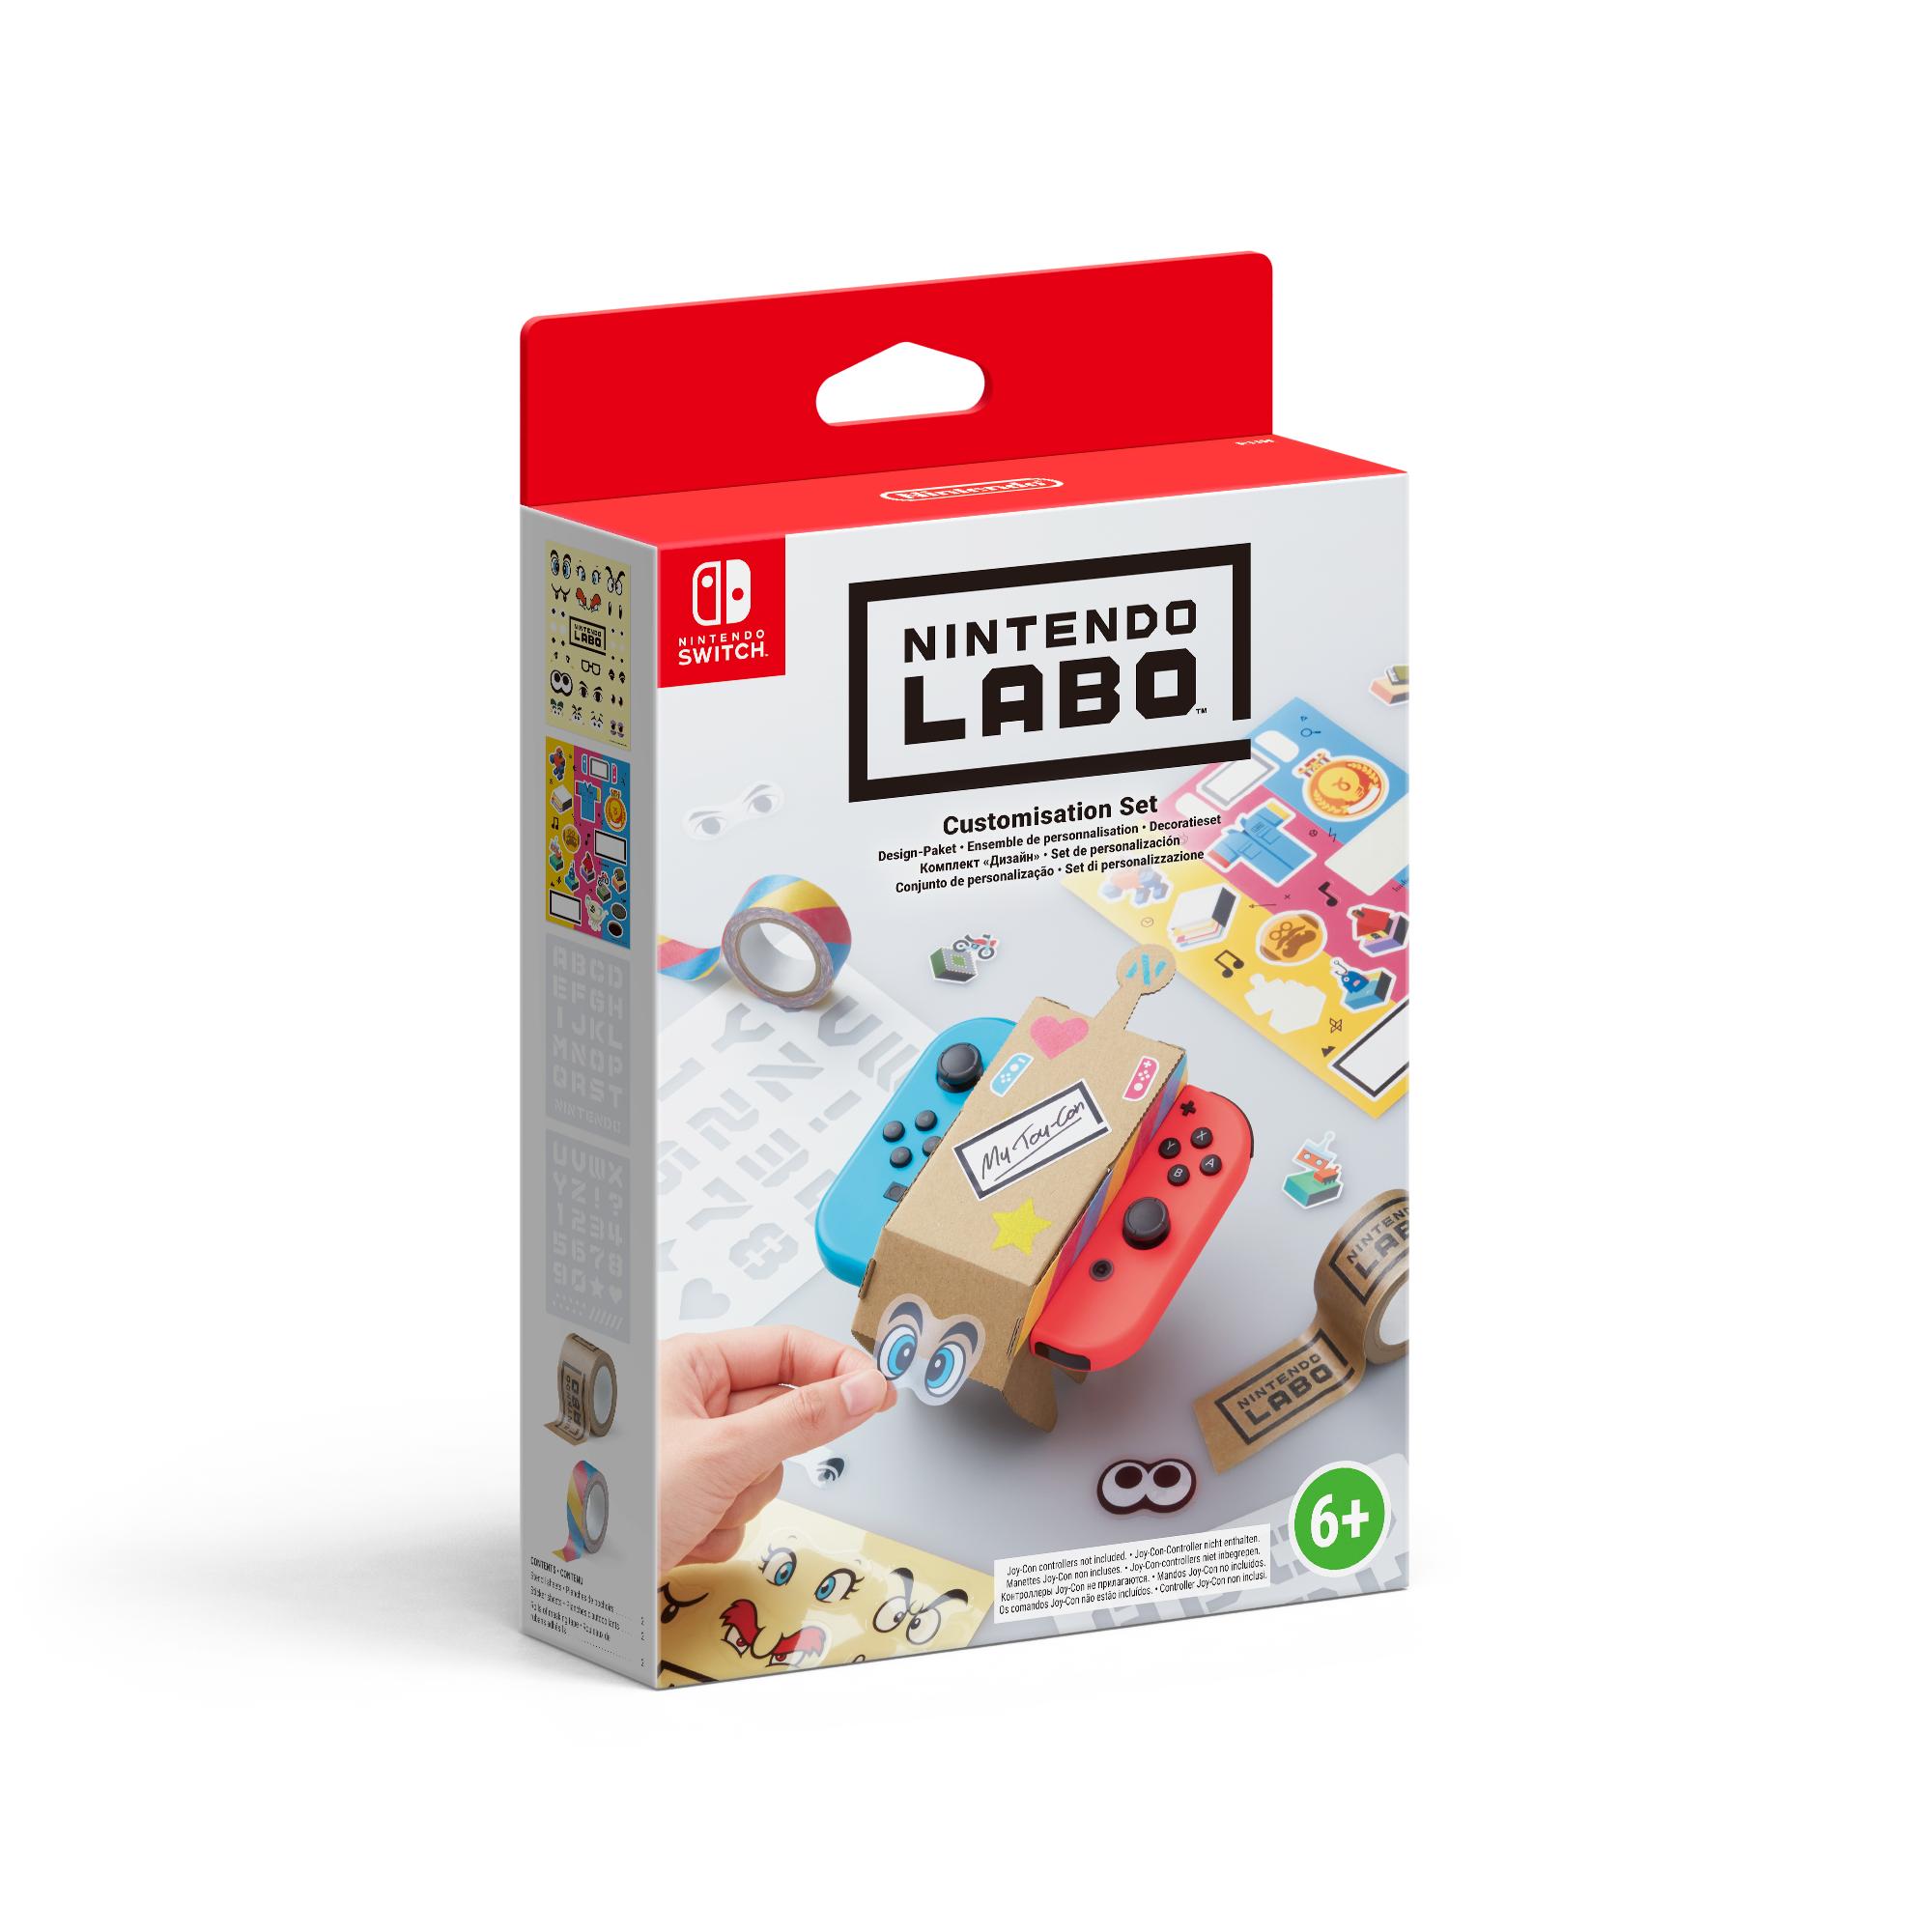 Labo Customisation Set